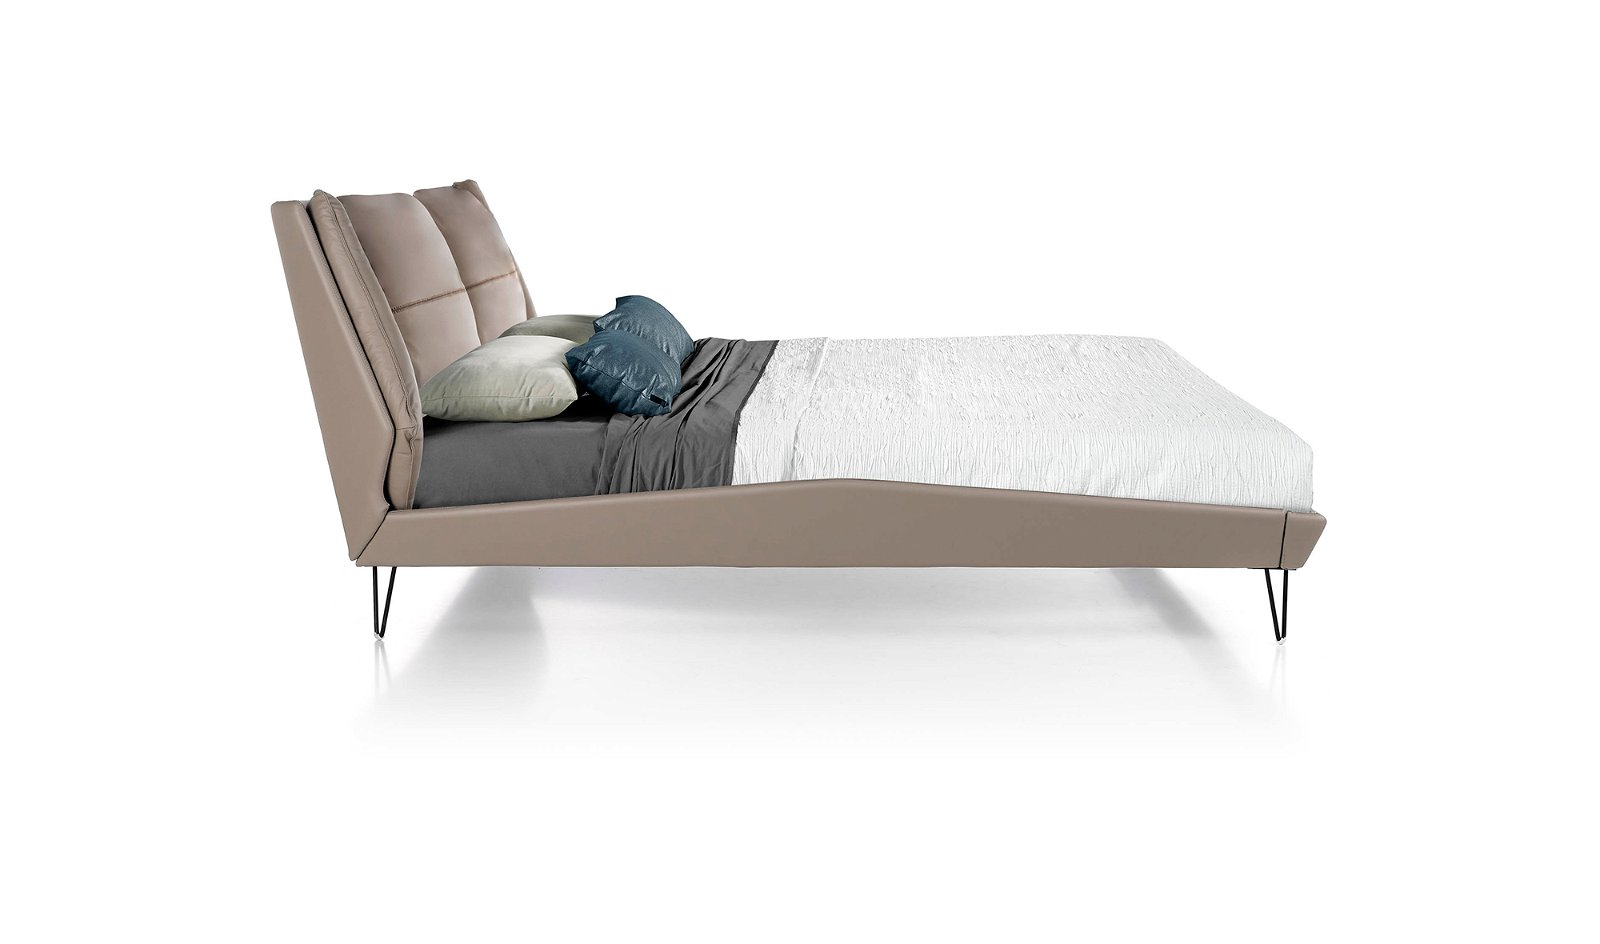 Cama tapizada piel Nicola para colchón 180x200